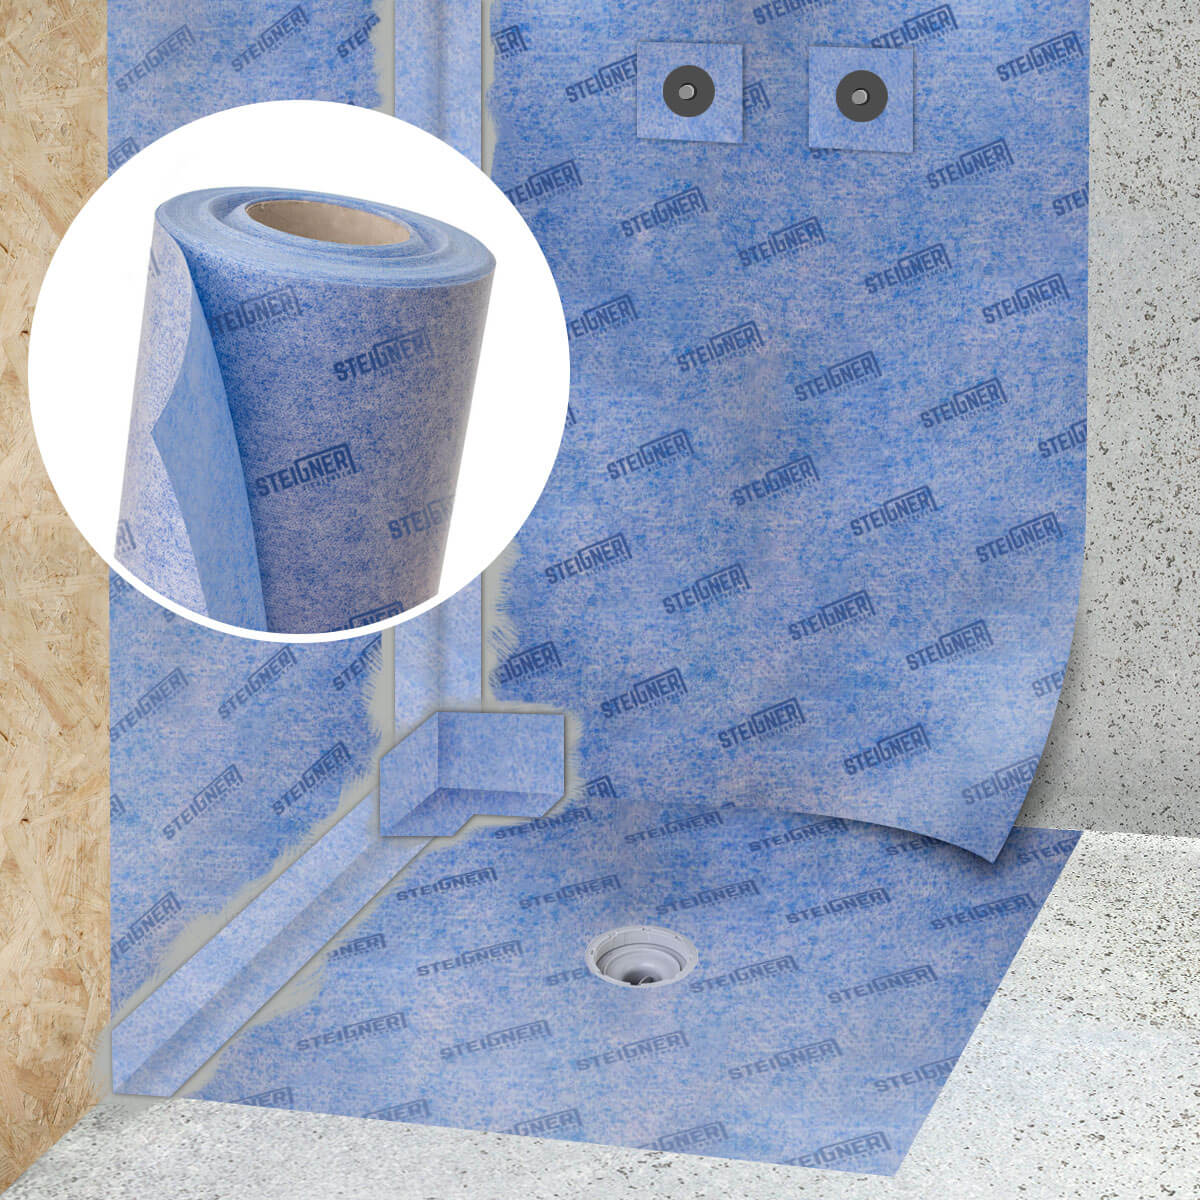 abdichtungsbahn entkopplungsmatte steigner dichtungen jumbo shop. Black Bedroom Furniture Sets. Home Design Ideas